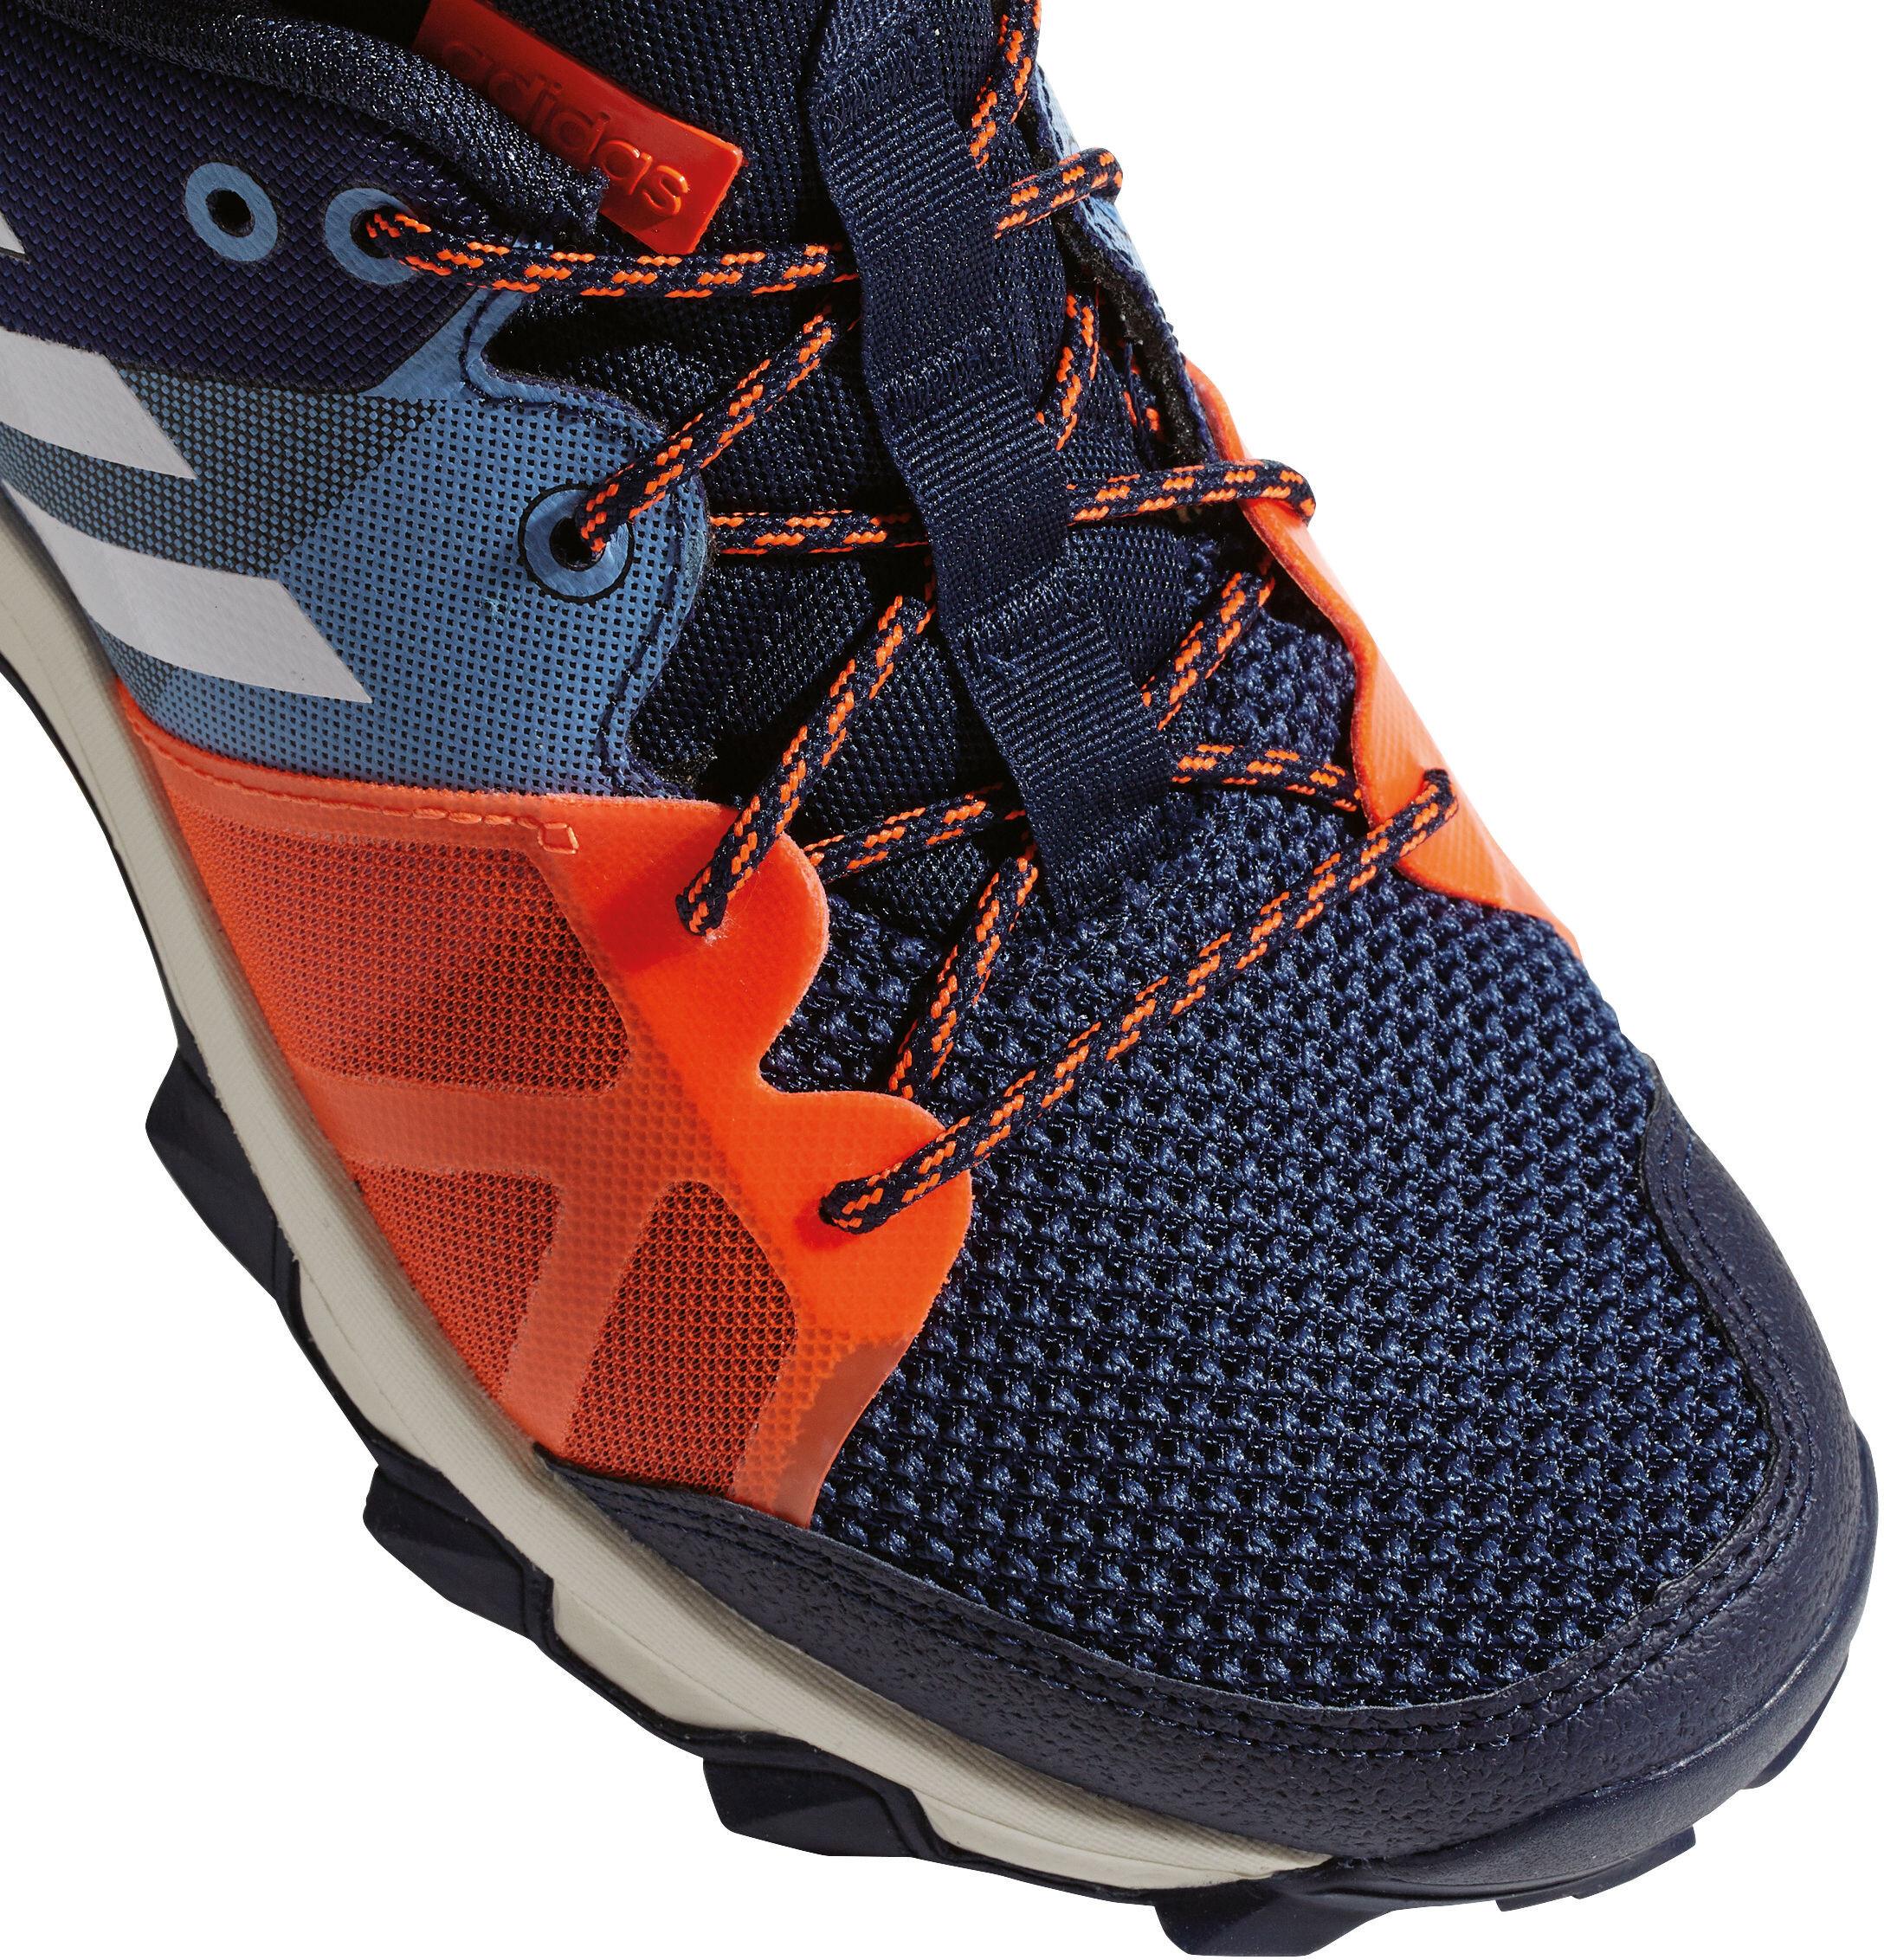 589f2e20edf791 Adidas Kanadia 8.1 Trail Running Shoe